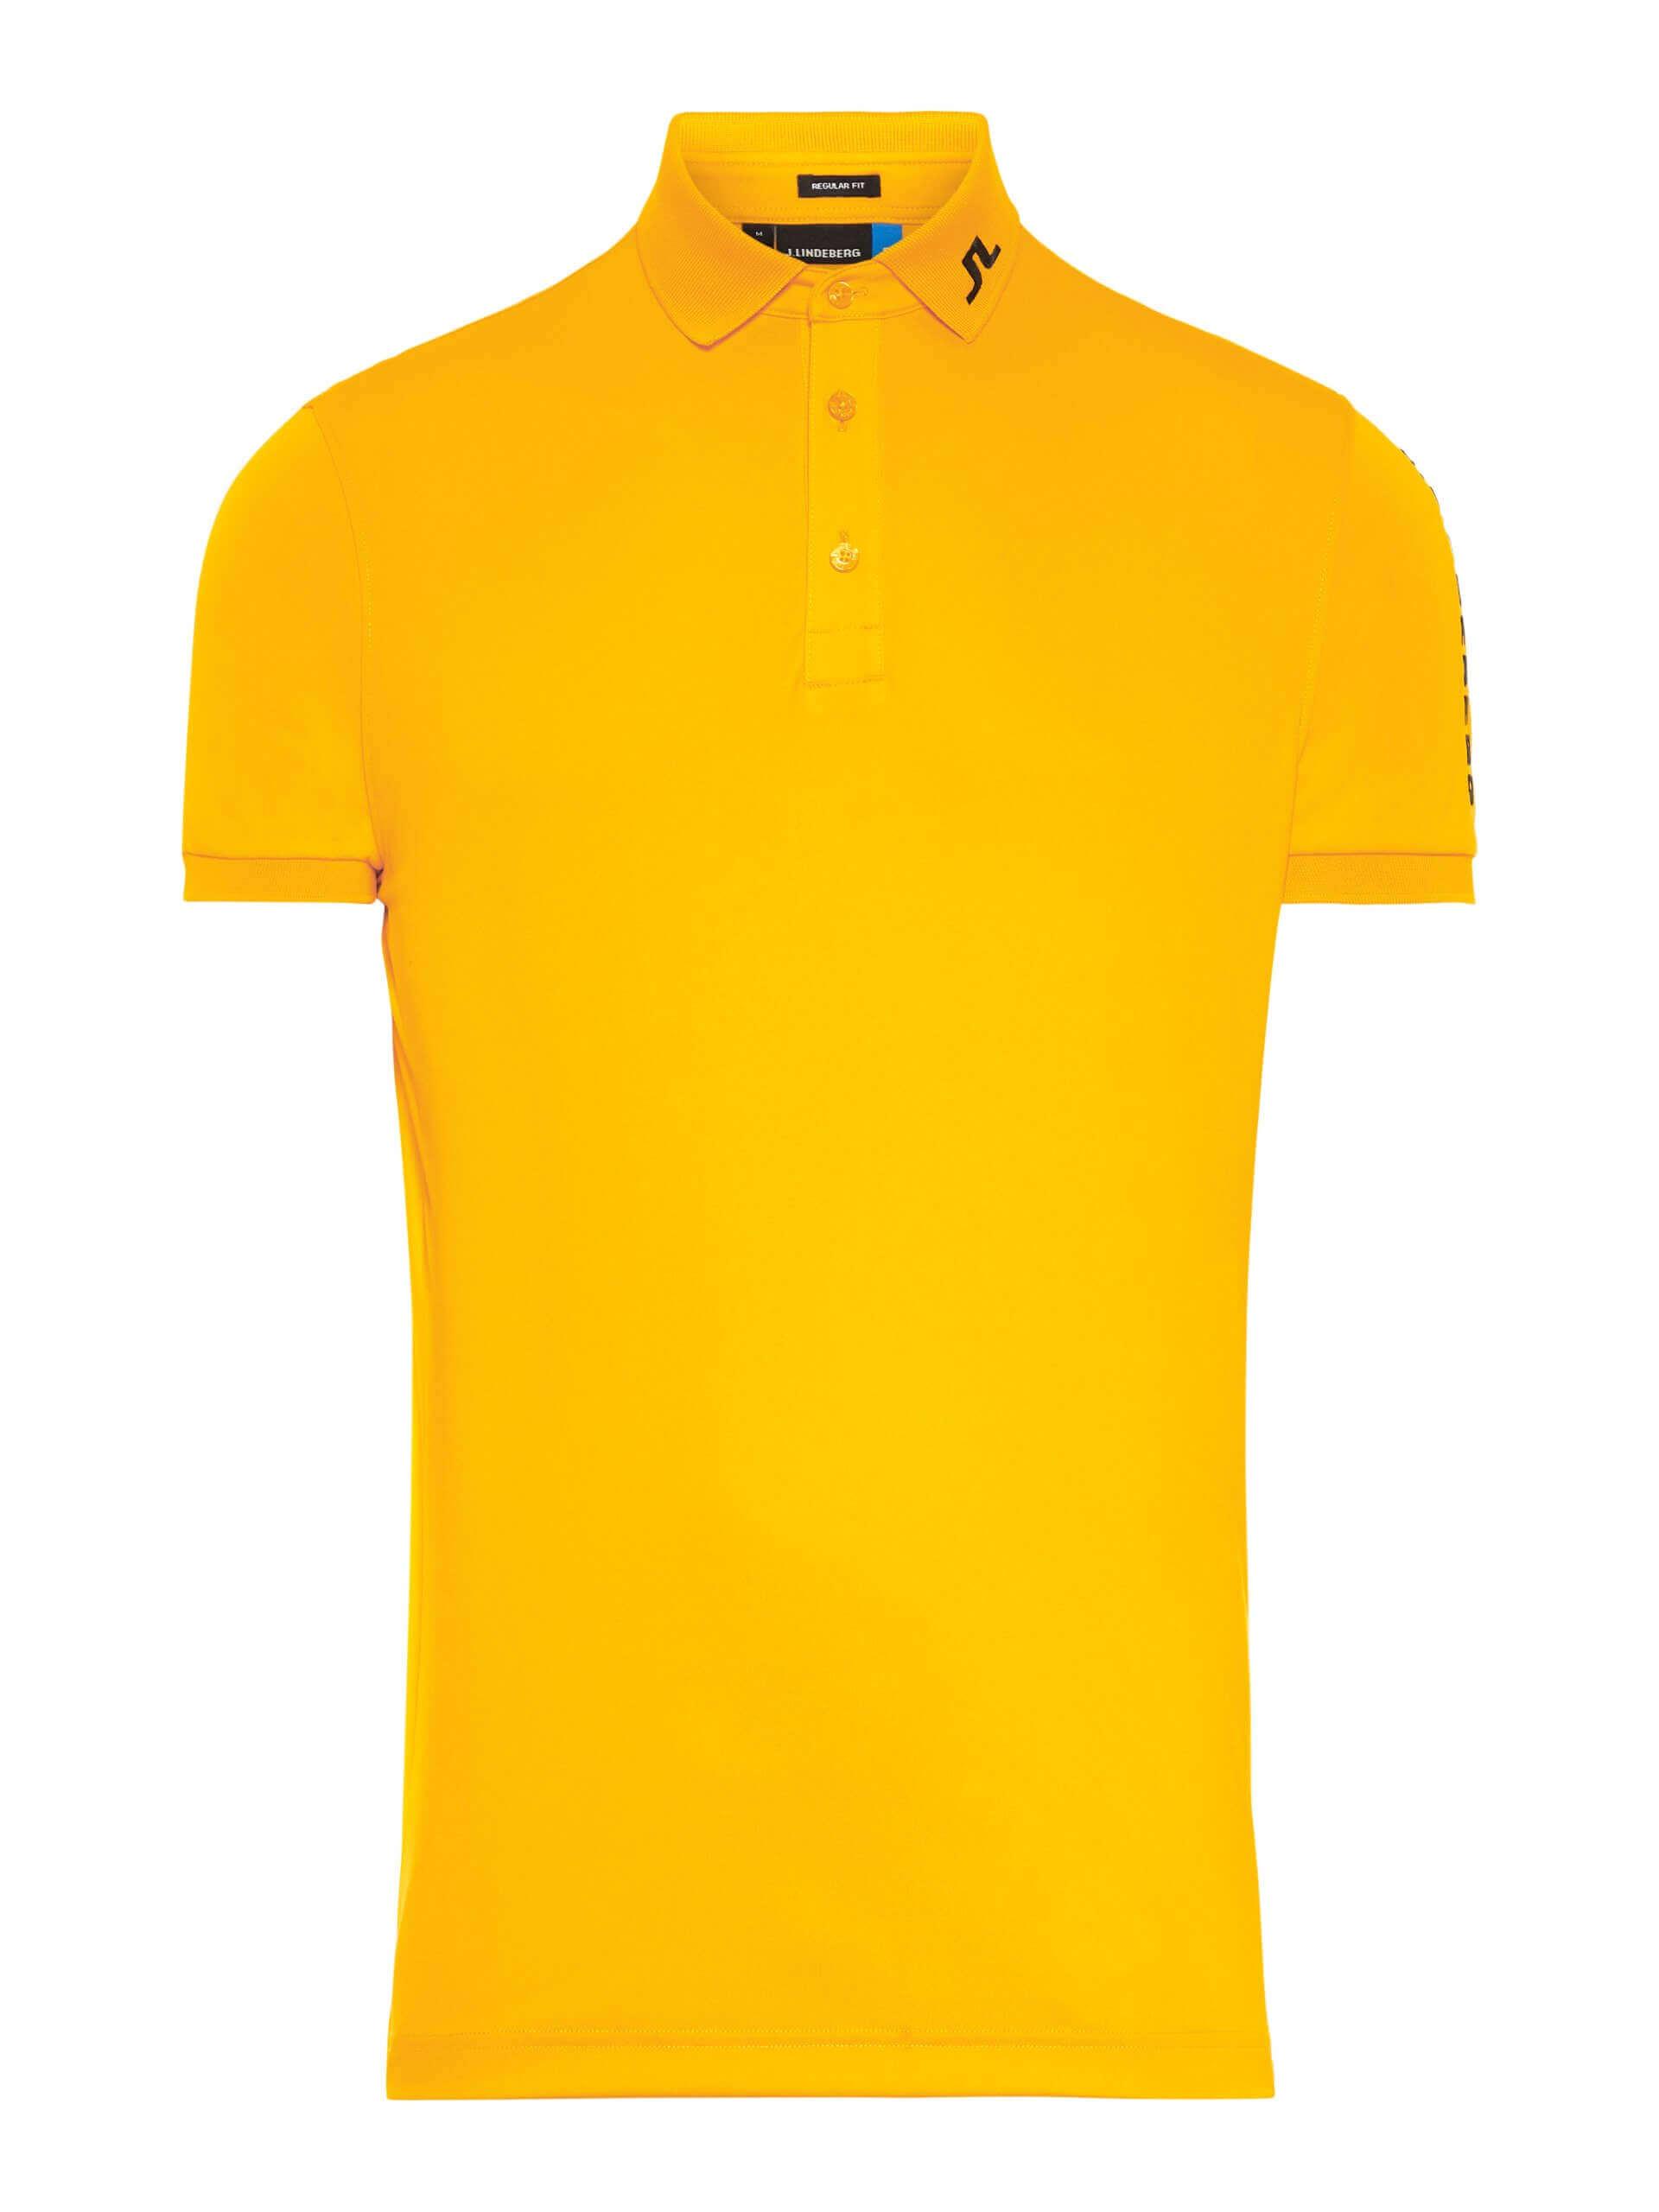 J.Lindeberg Tour Tech Reg Polo TX Jersey in warm orange